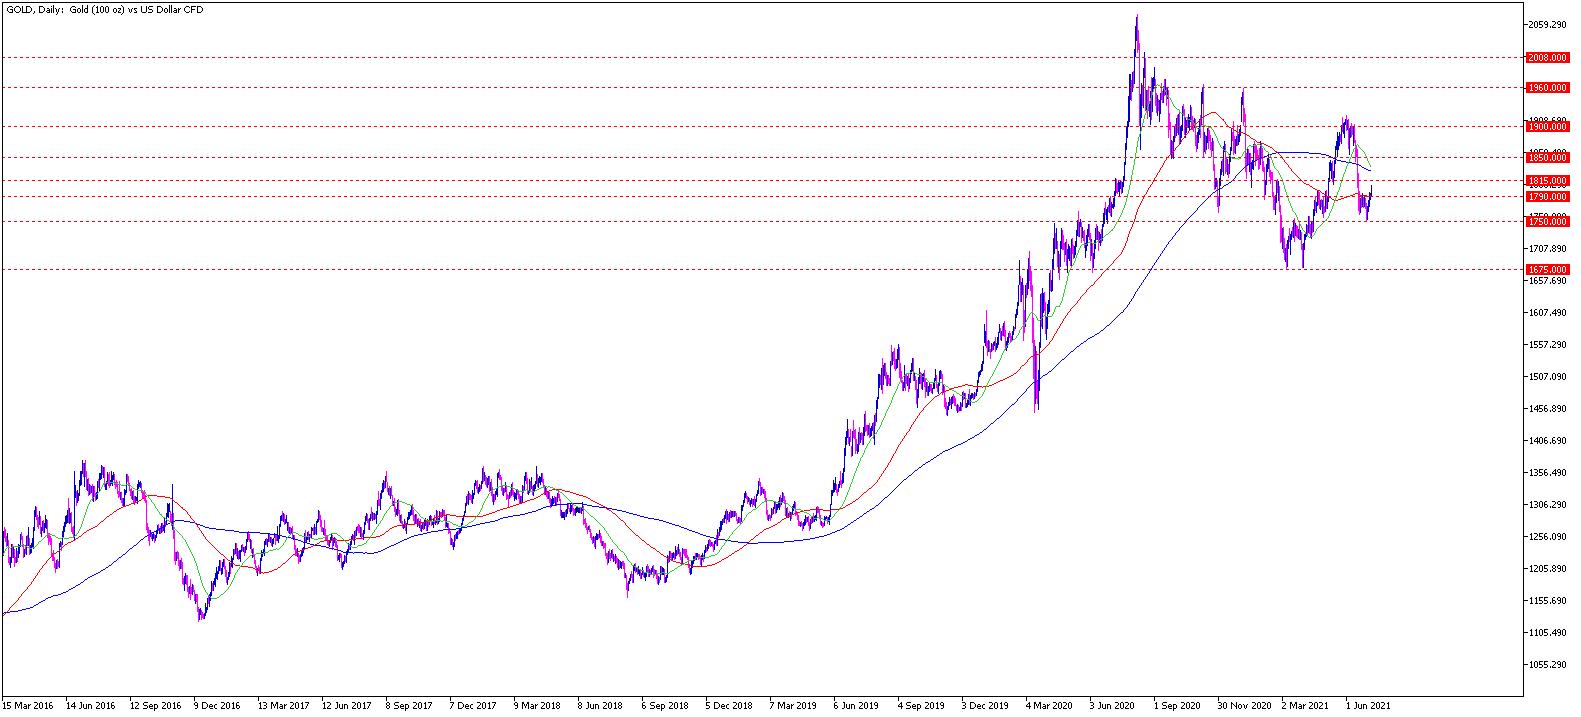 Gold Chartanalyse daily am 06.07.21 - Gold Aktuell